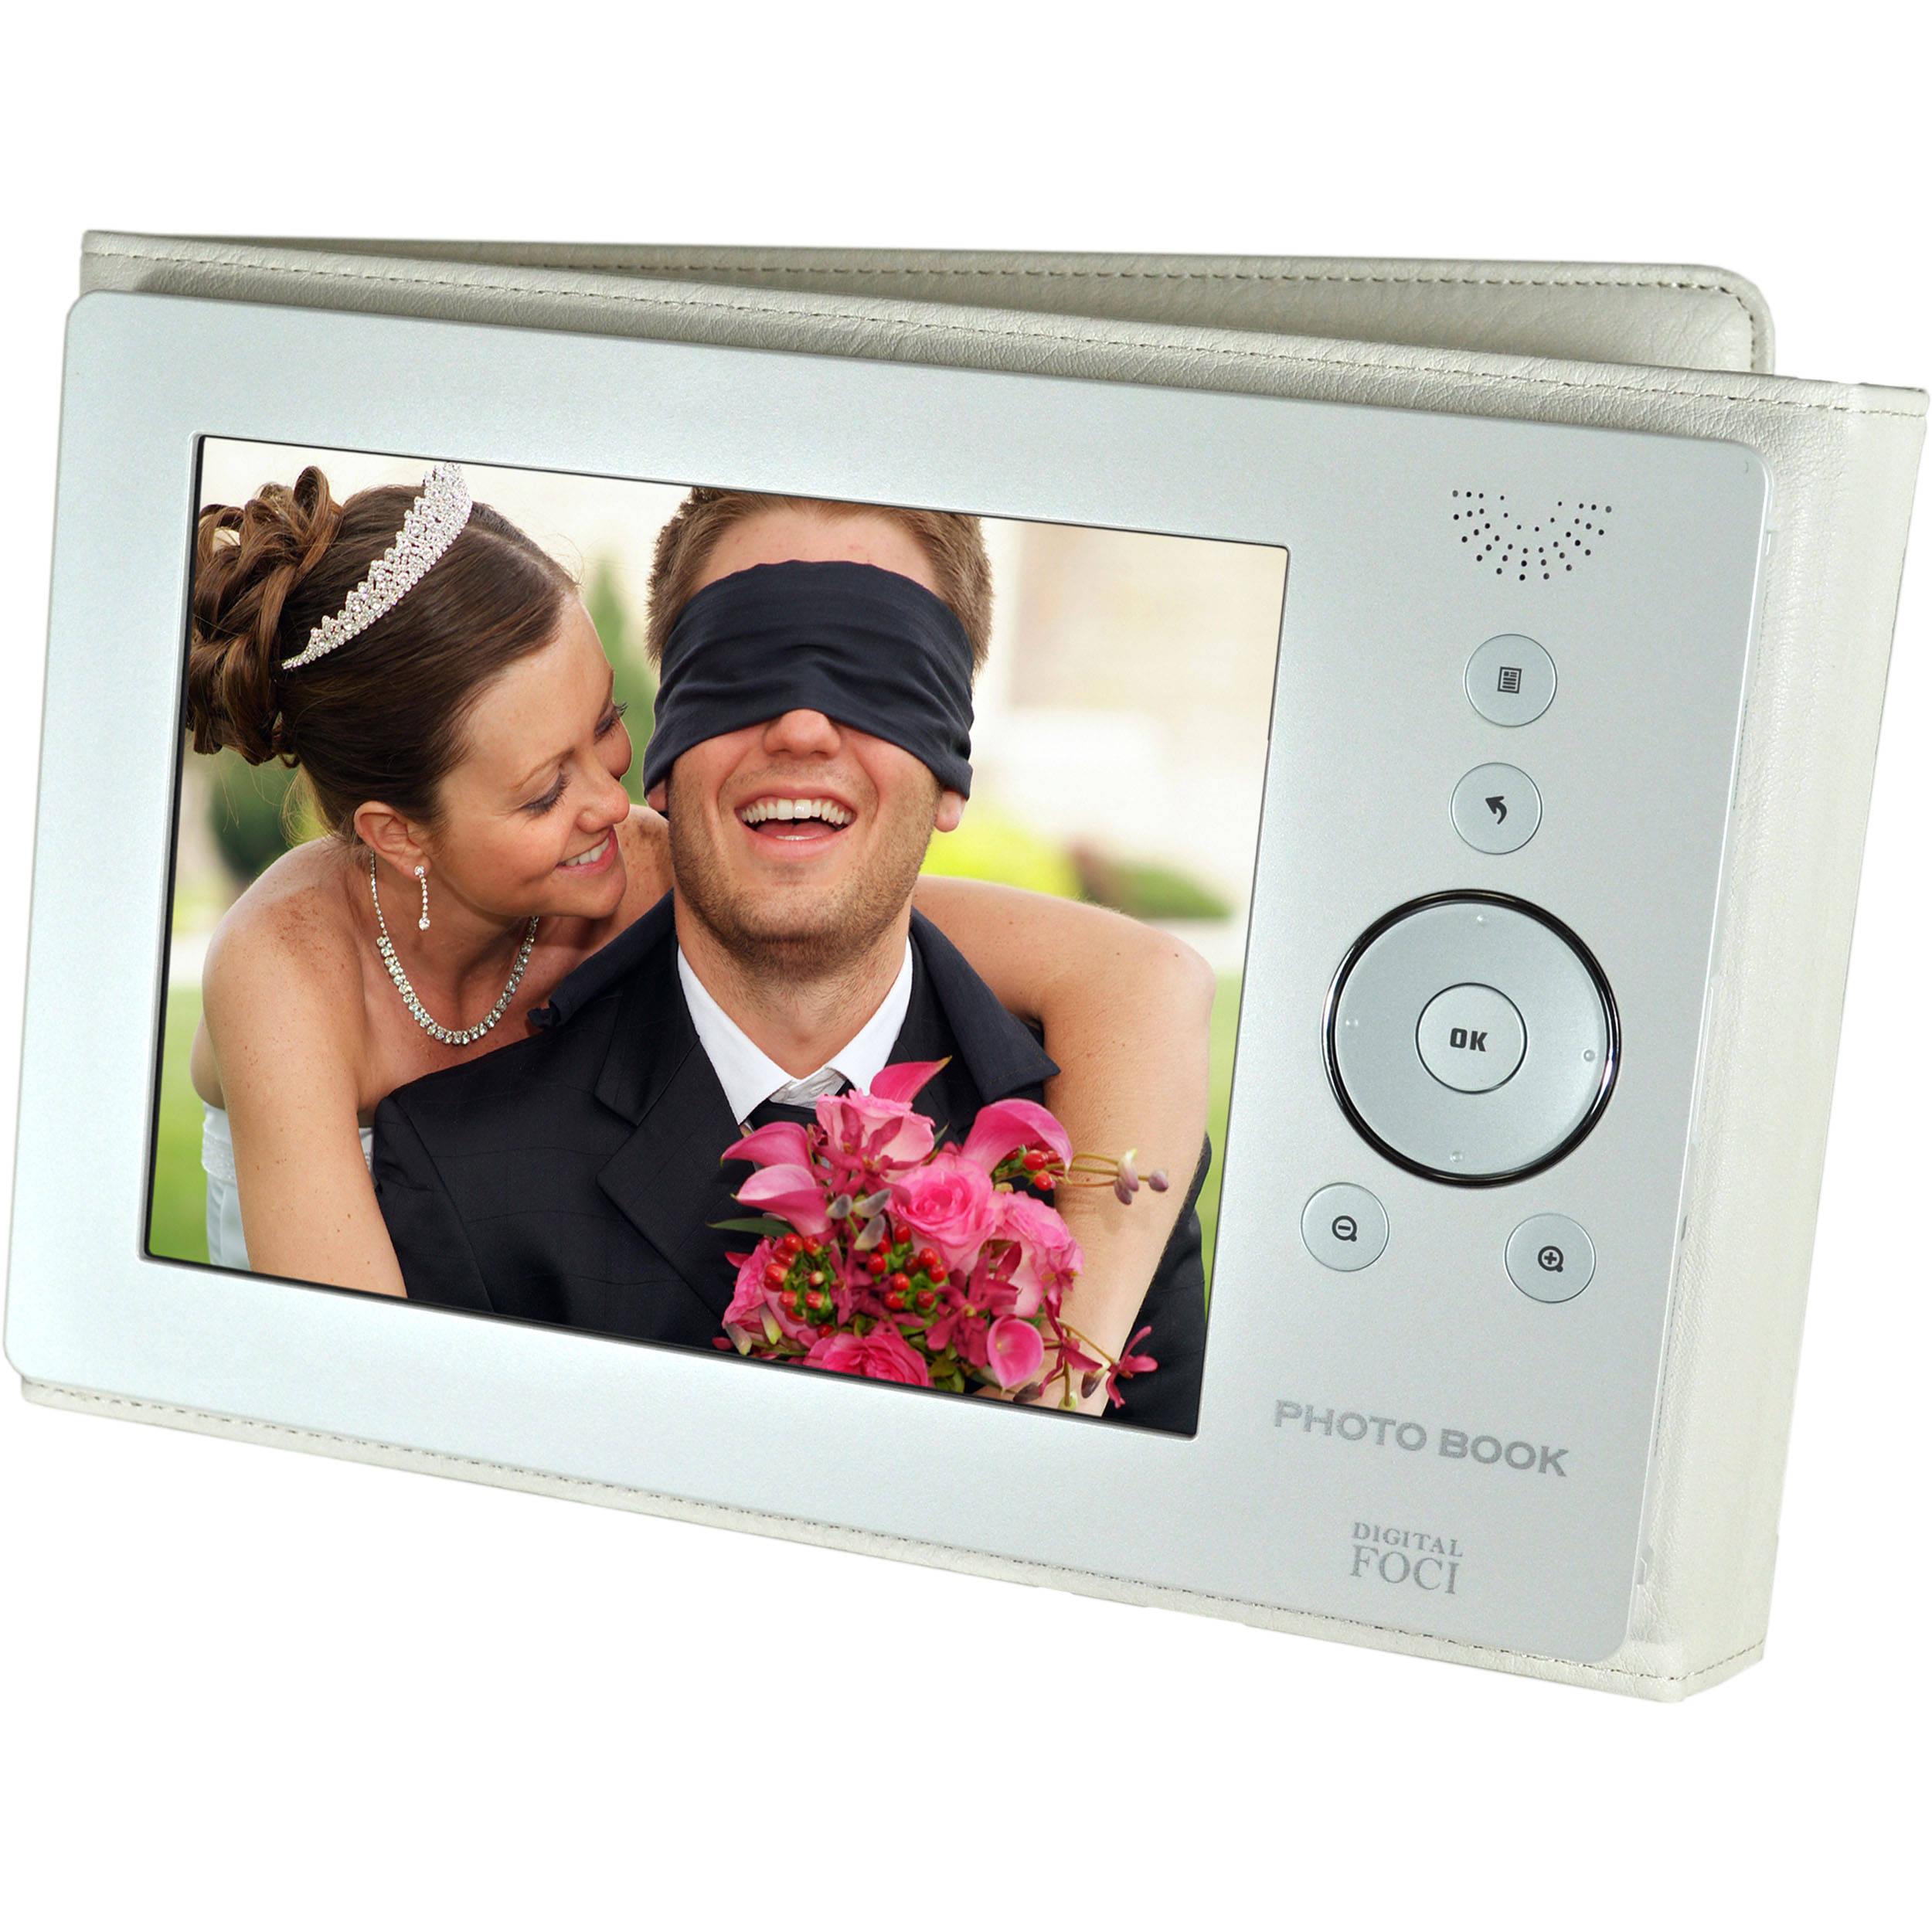 M: Digital Foci - Picture Porter Advanced Digital foci photo book